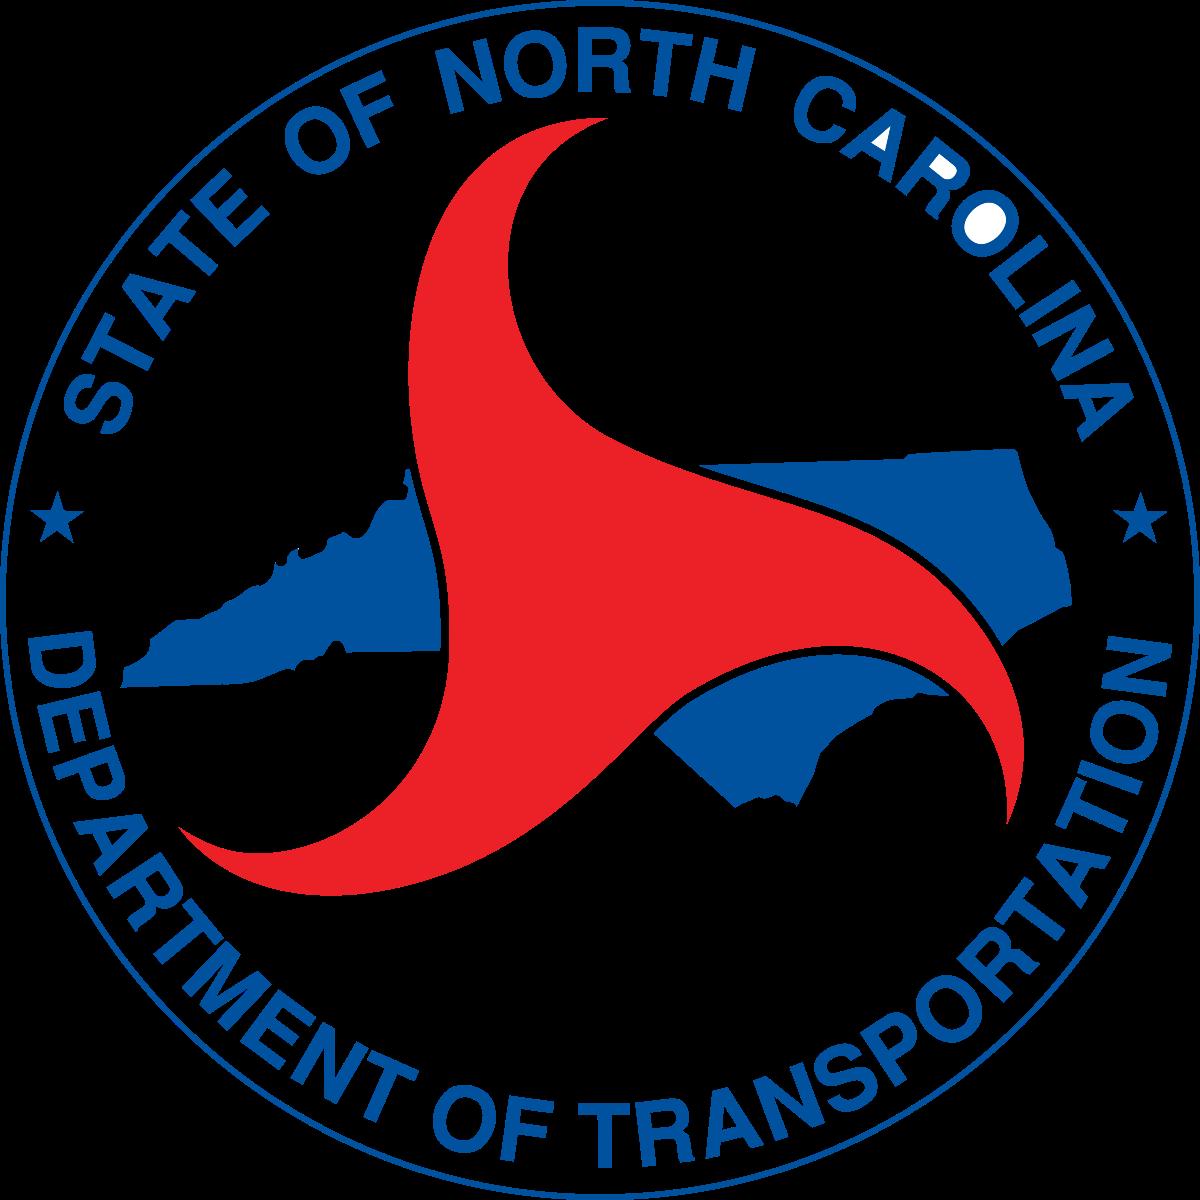 North Carolina Department of Transportation.